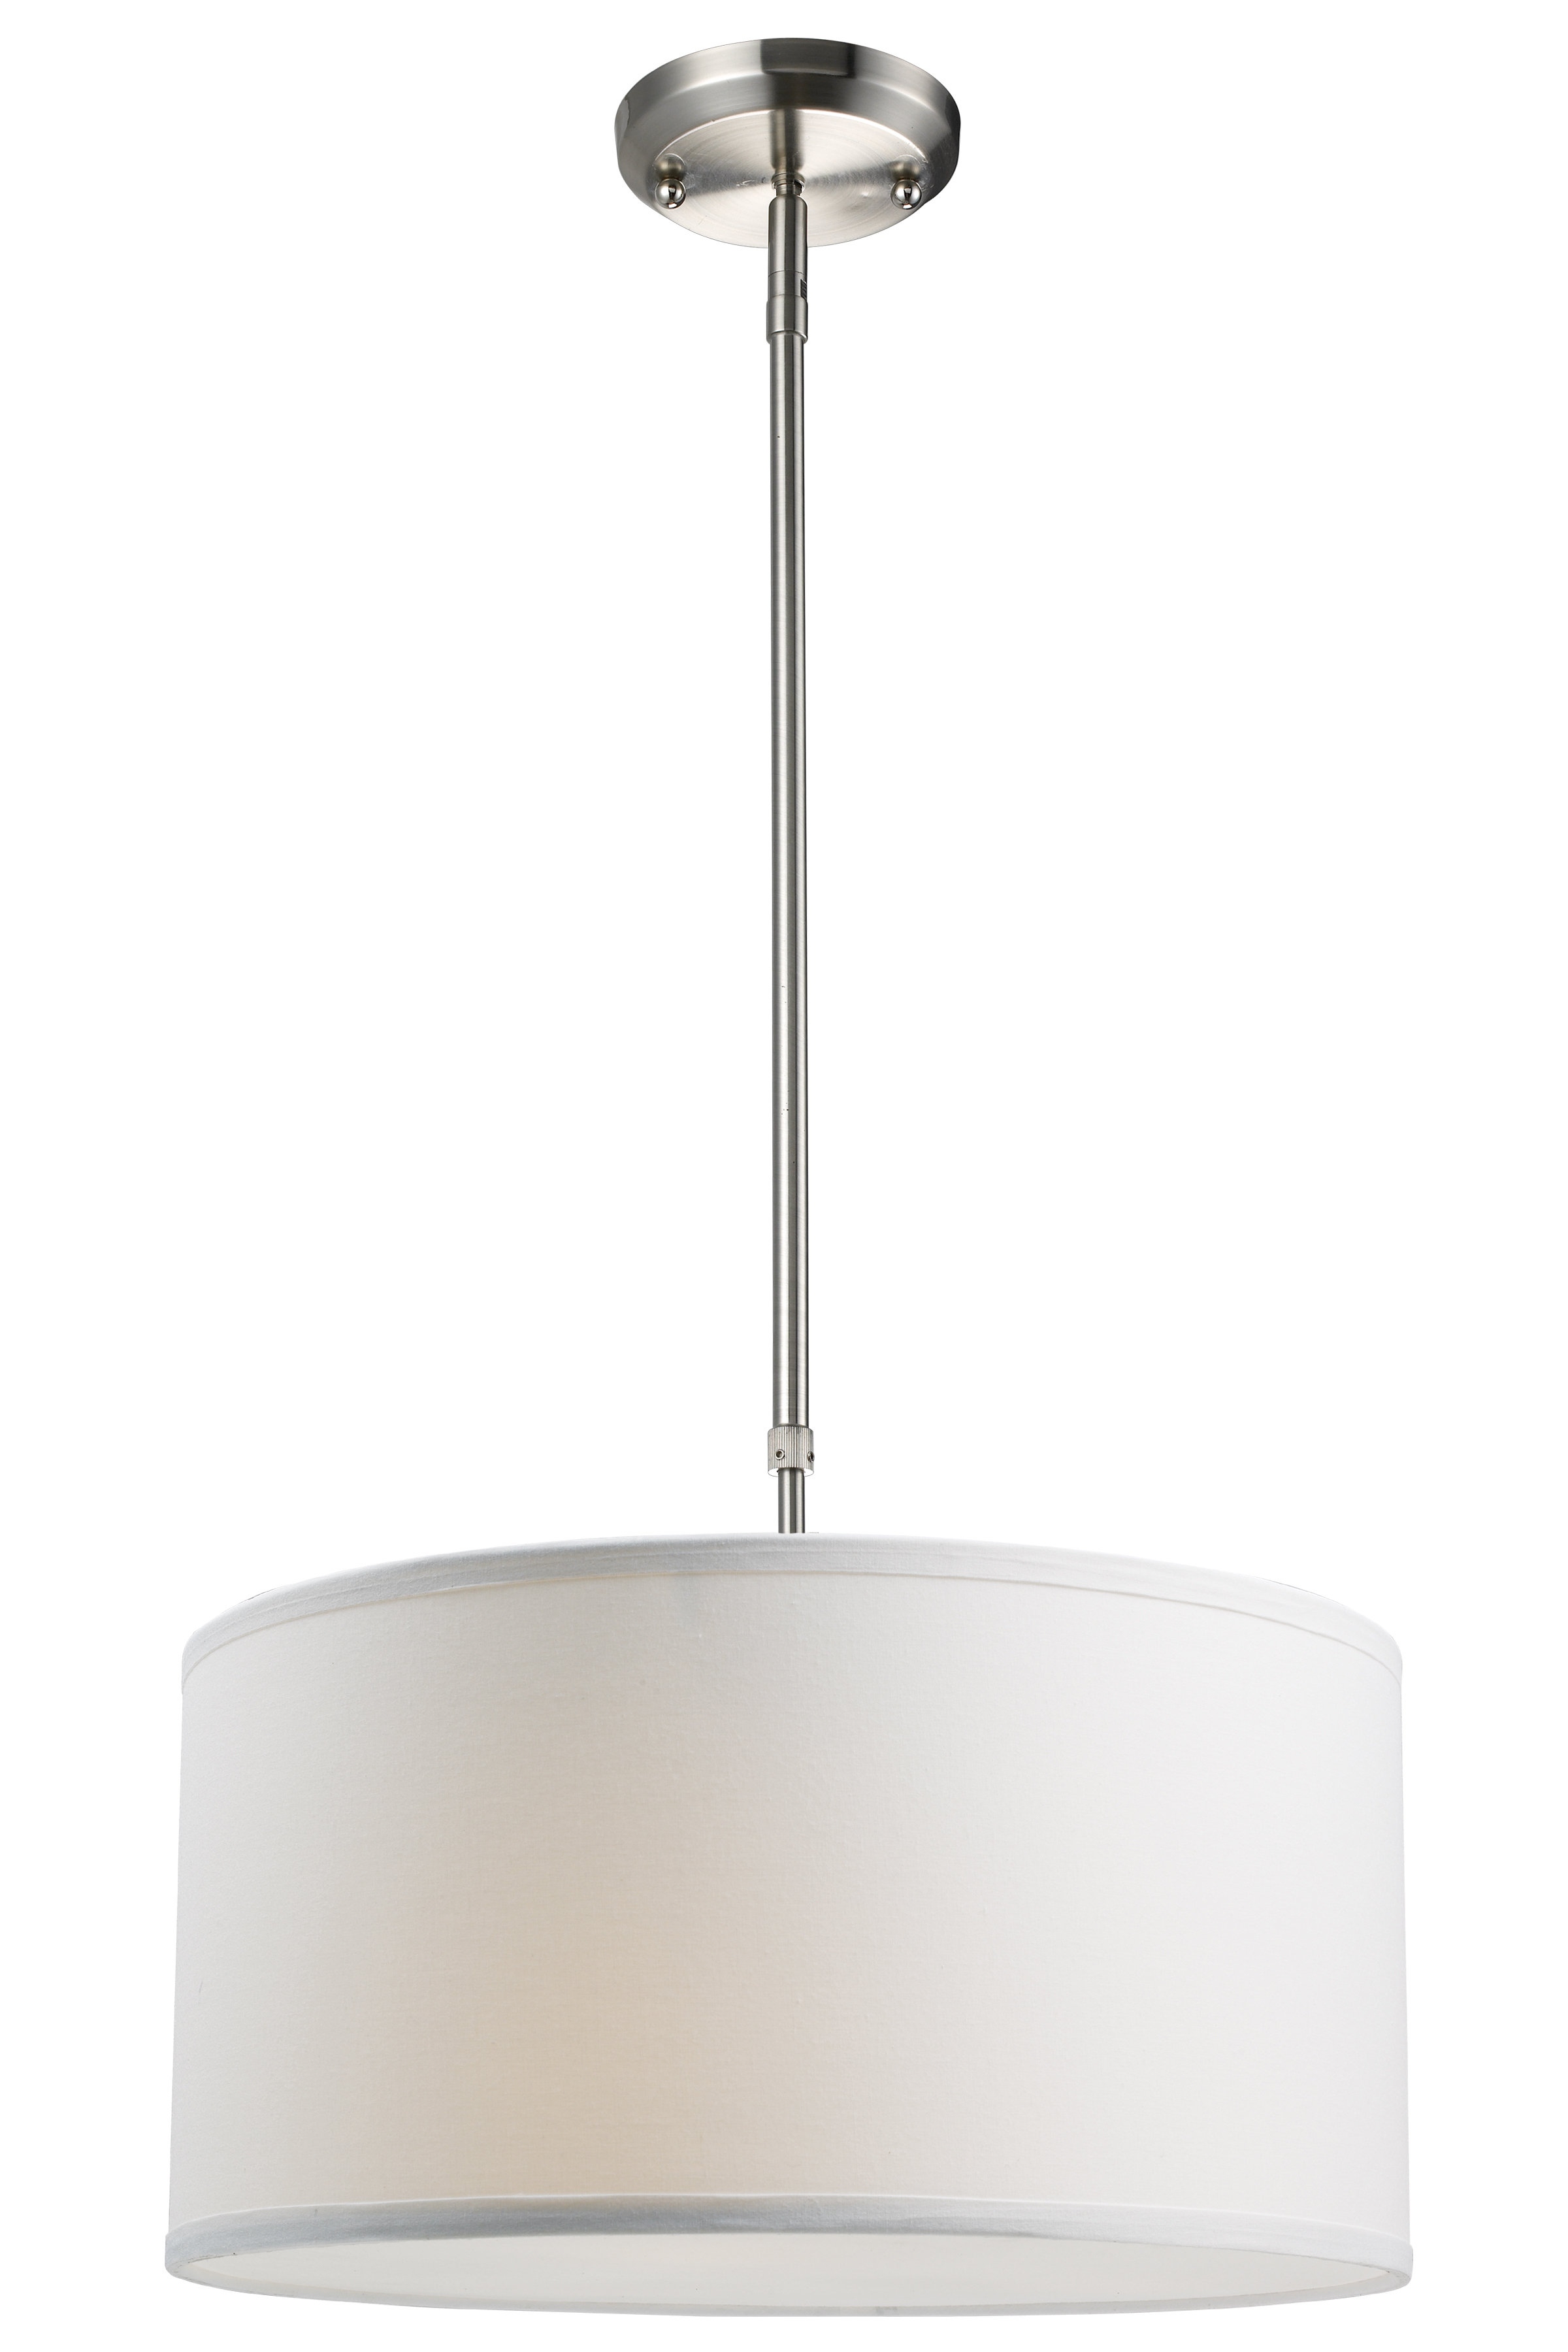 Radtke 3 Light Single Drum Pendants In Widely Used Kasey 3 Light Single Drum Pendant (View 14 of 20)